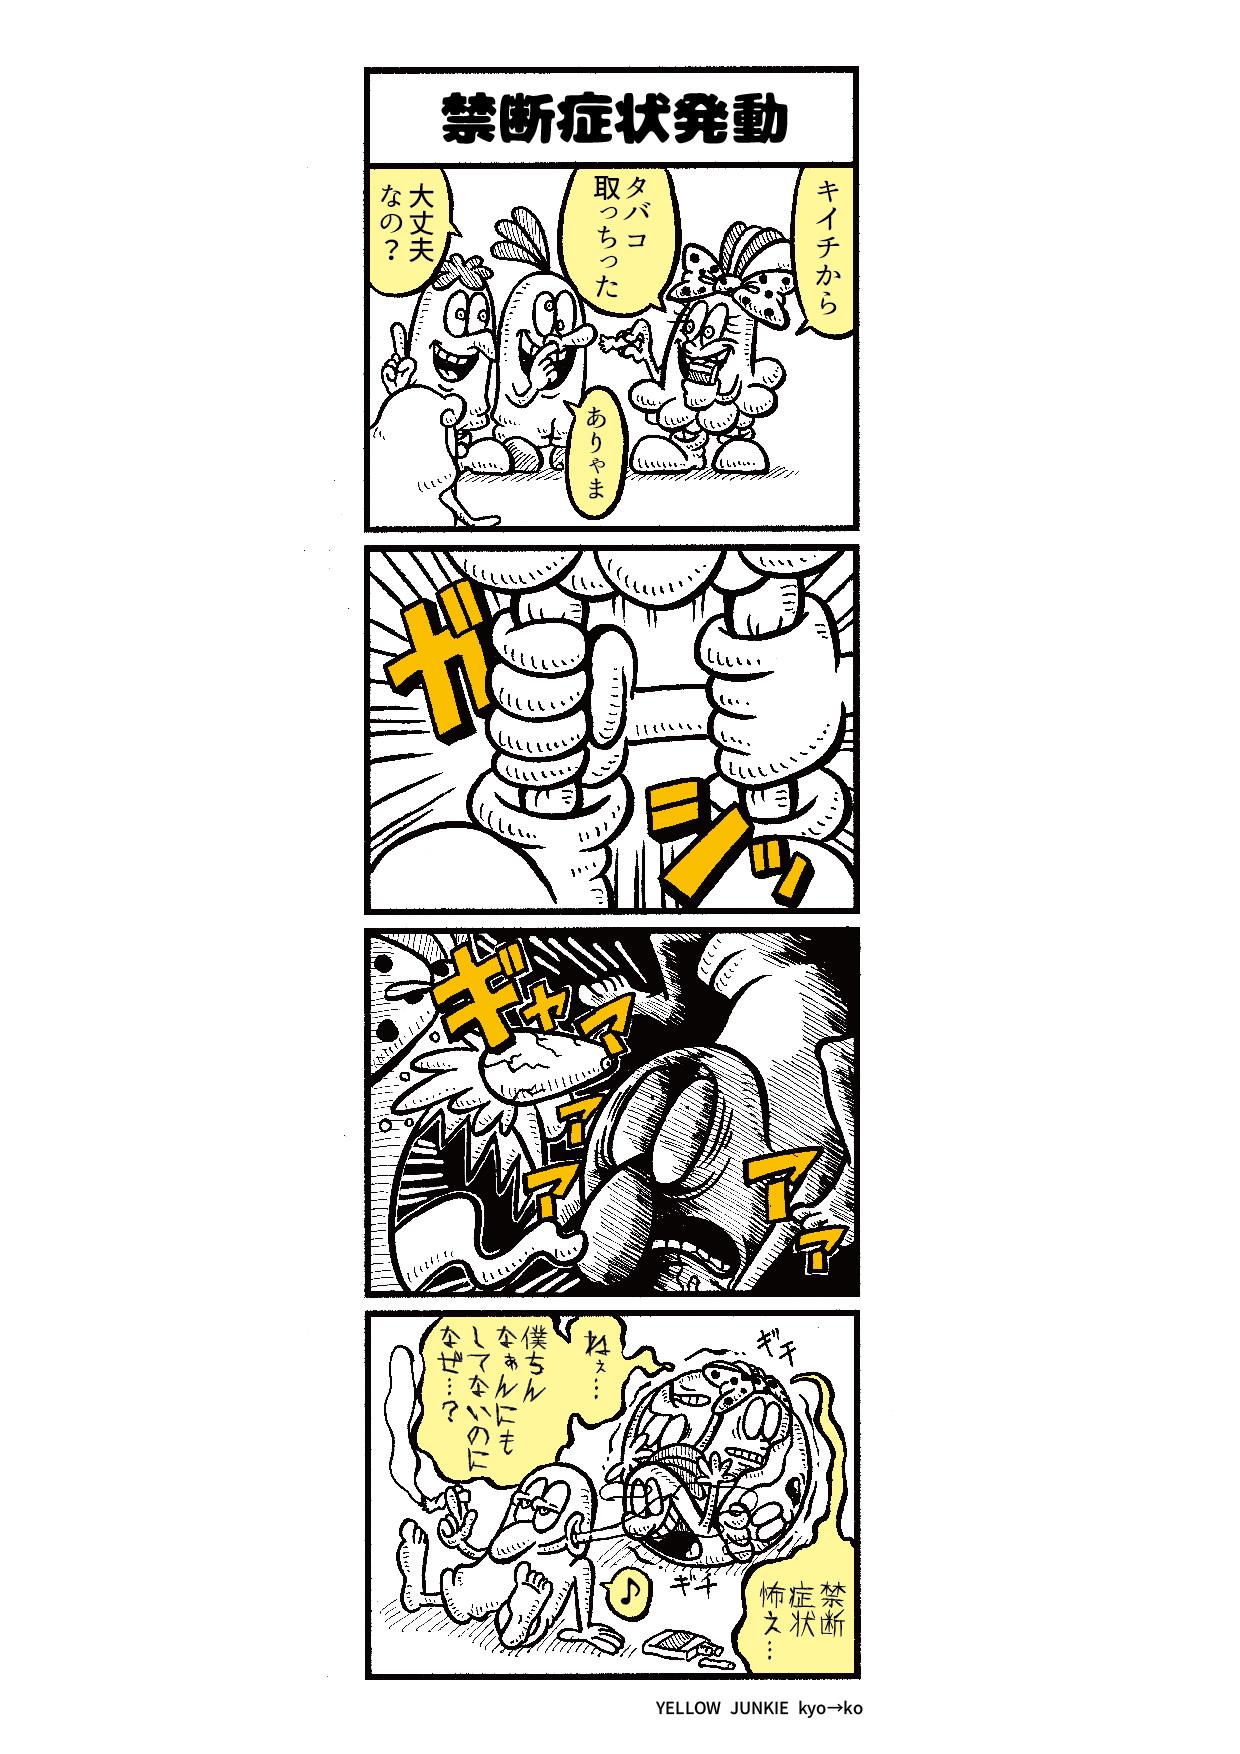 YELLOW JUNKIE「35話:禁断症状発動」